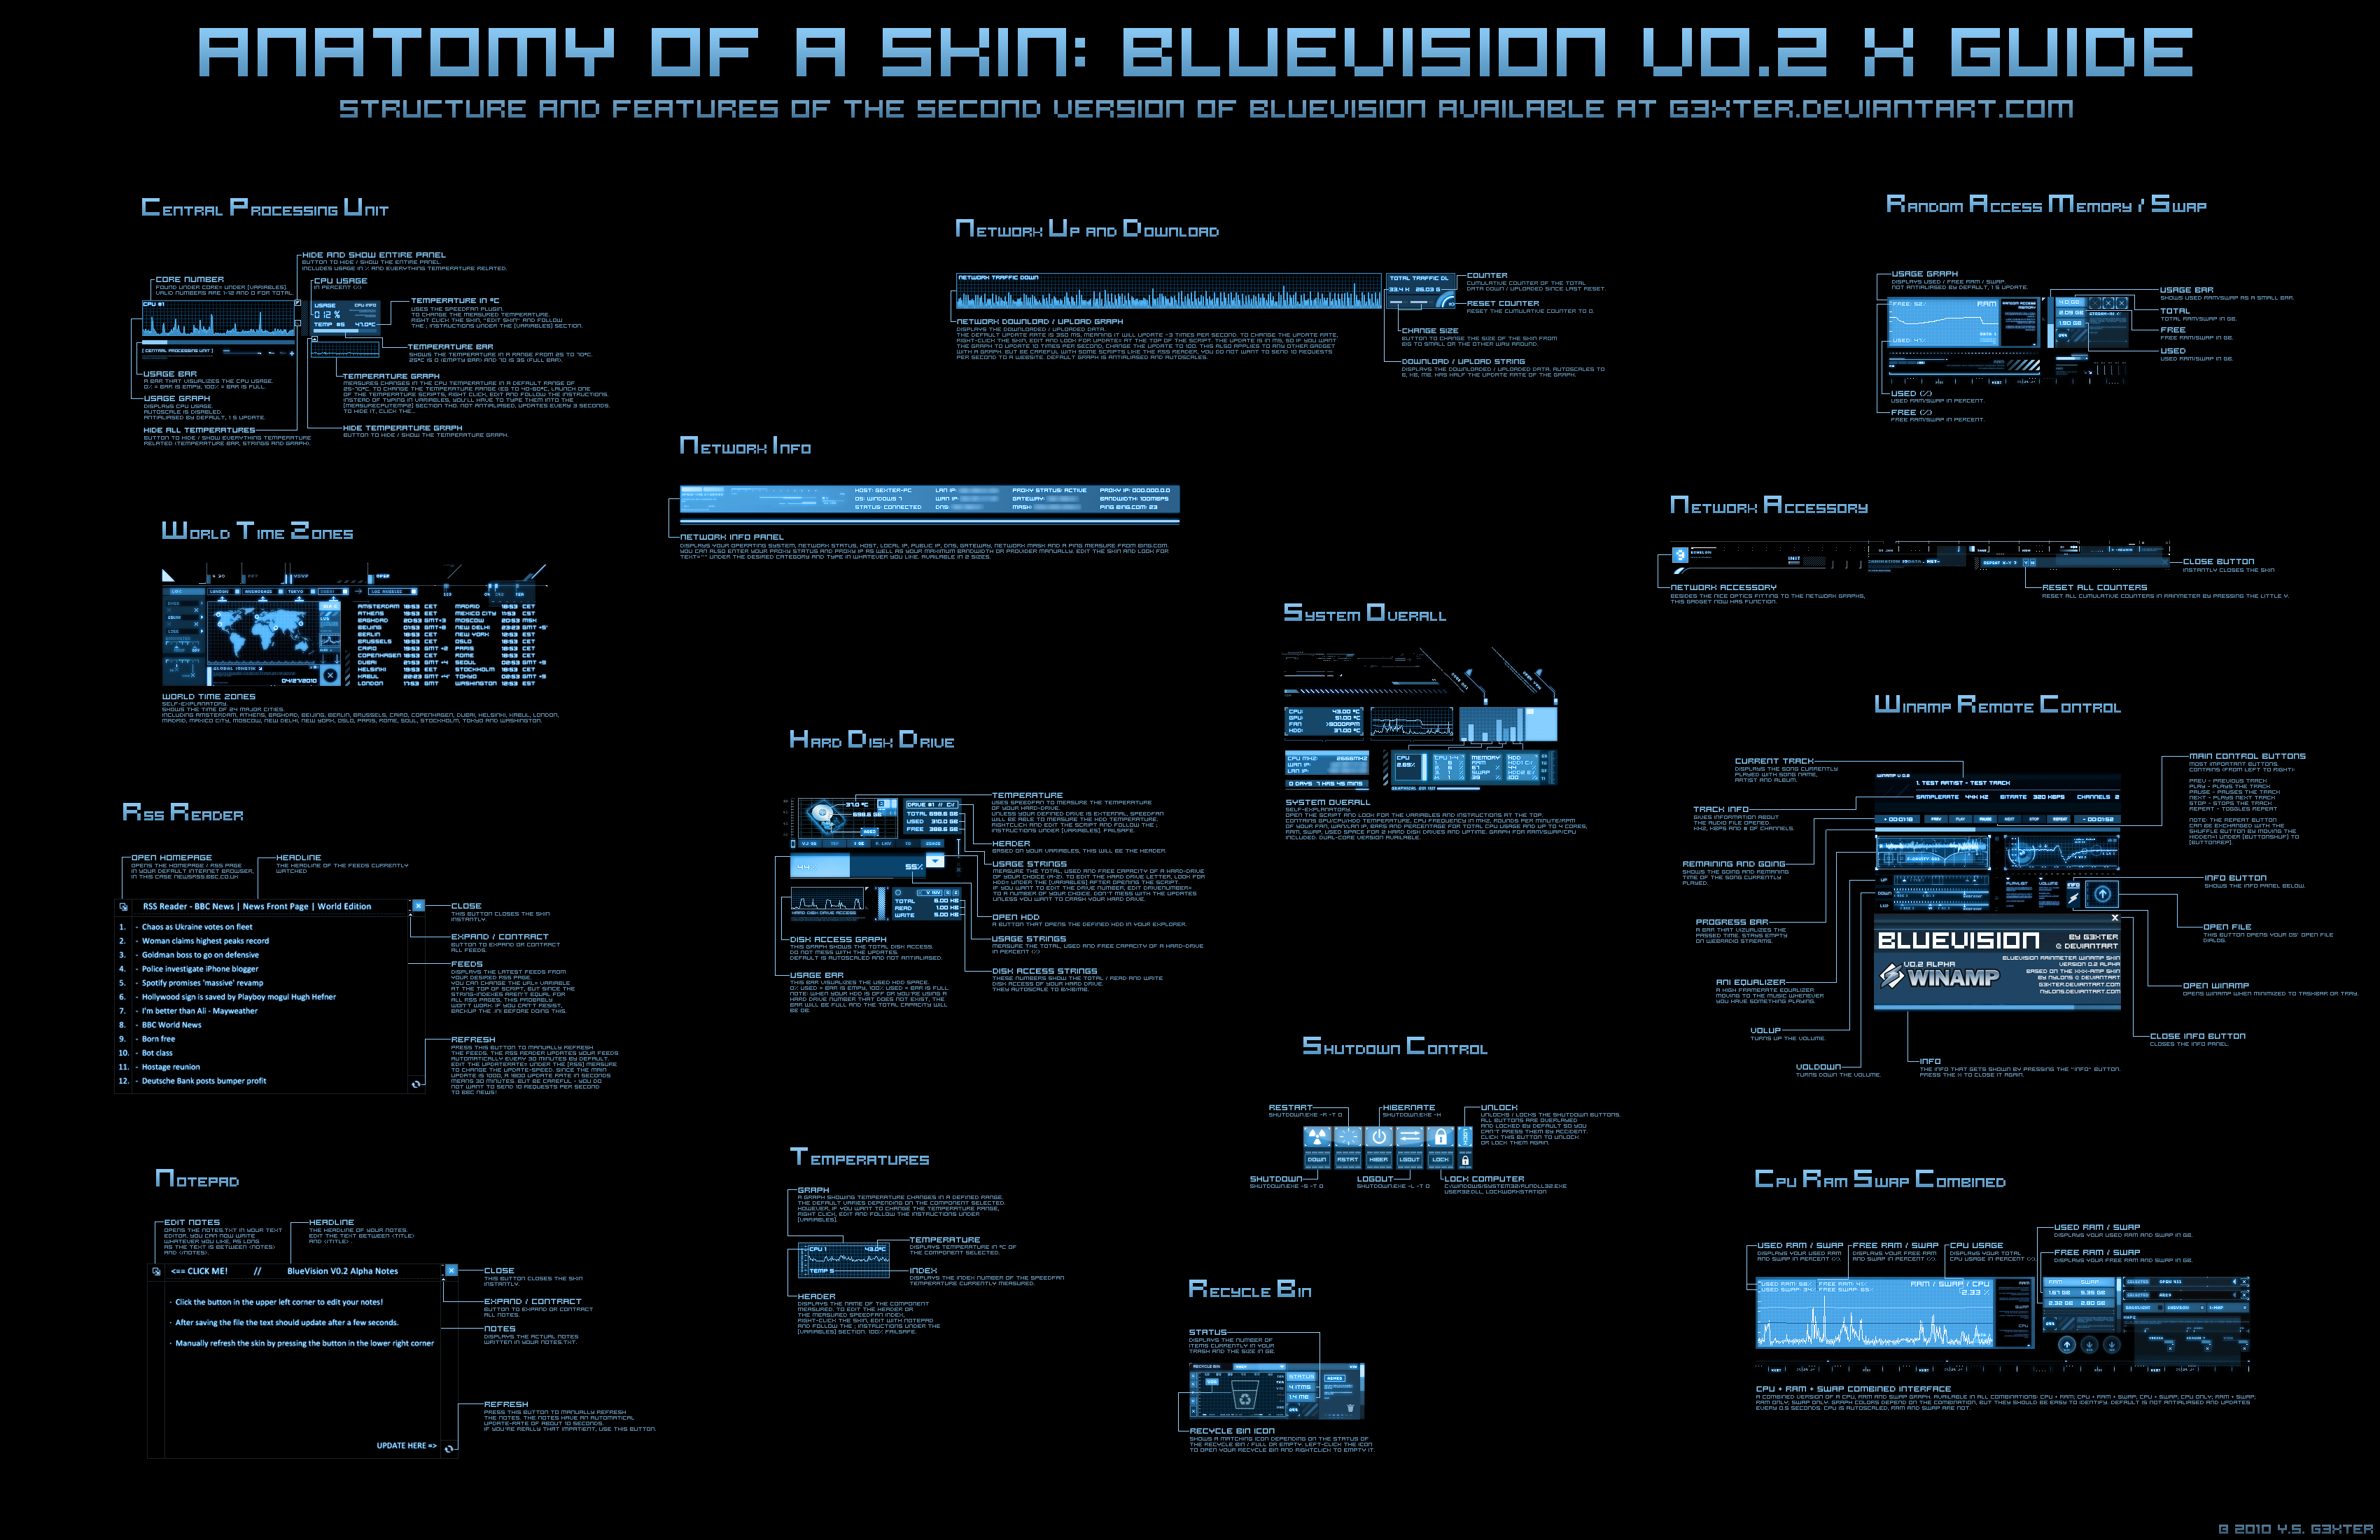 BlueVision V0.2 Alpha X Guide